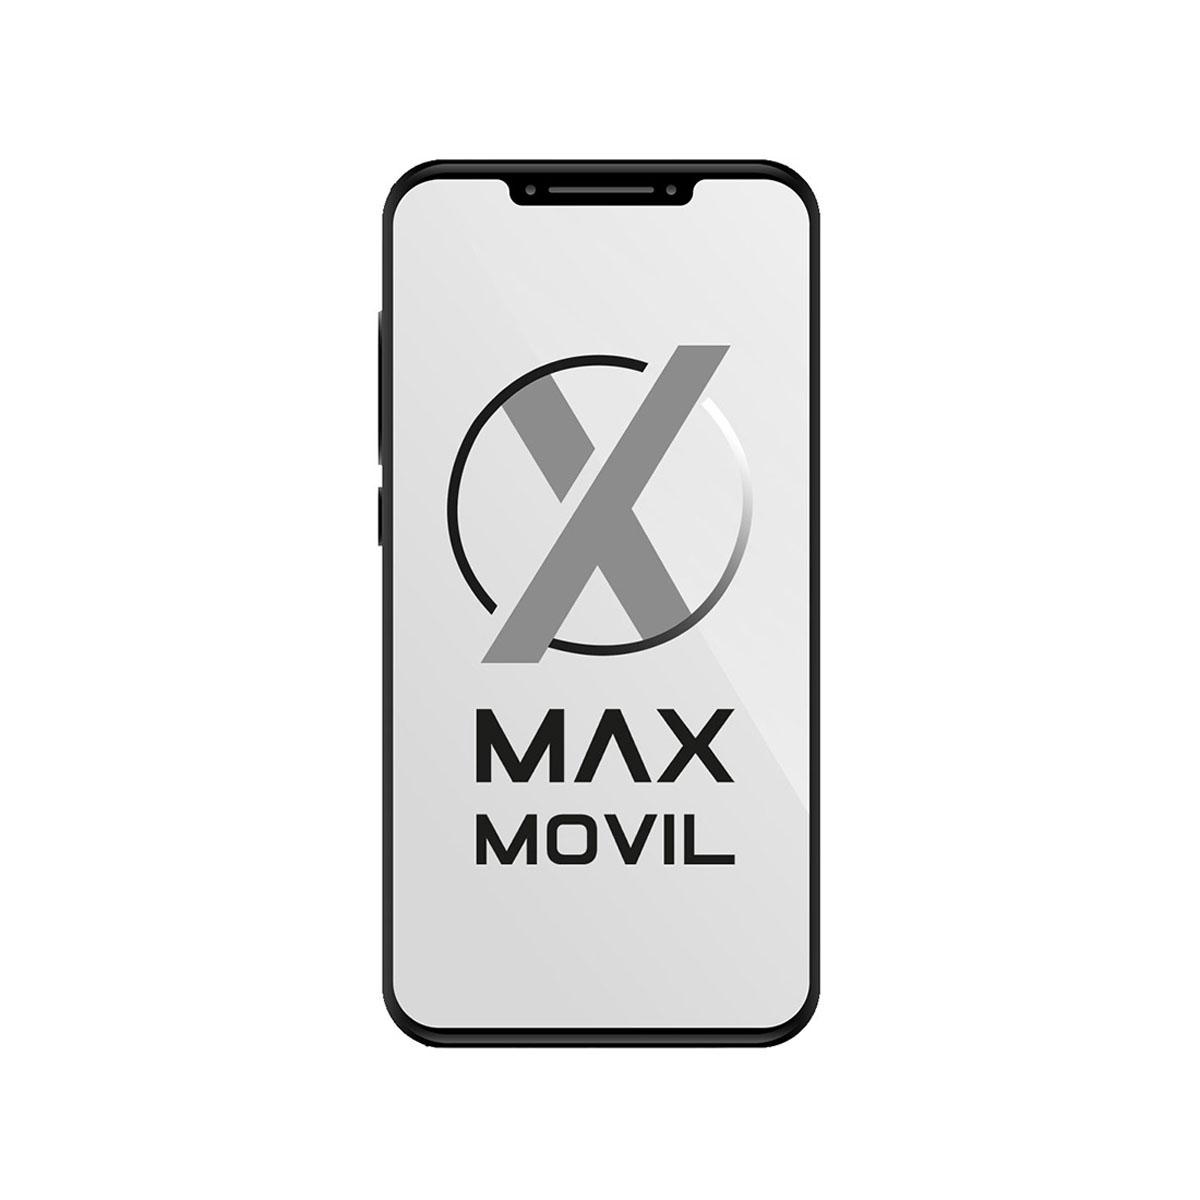 Adaptador de corriente para MacBook (60W, 100 - 240 V, 50 Hz) MC461Z/A